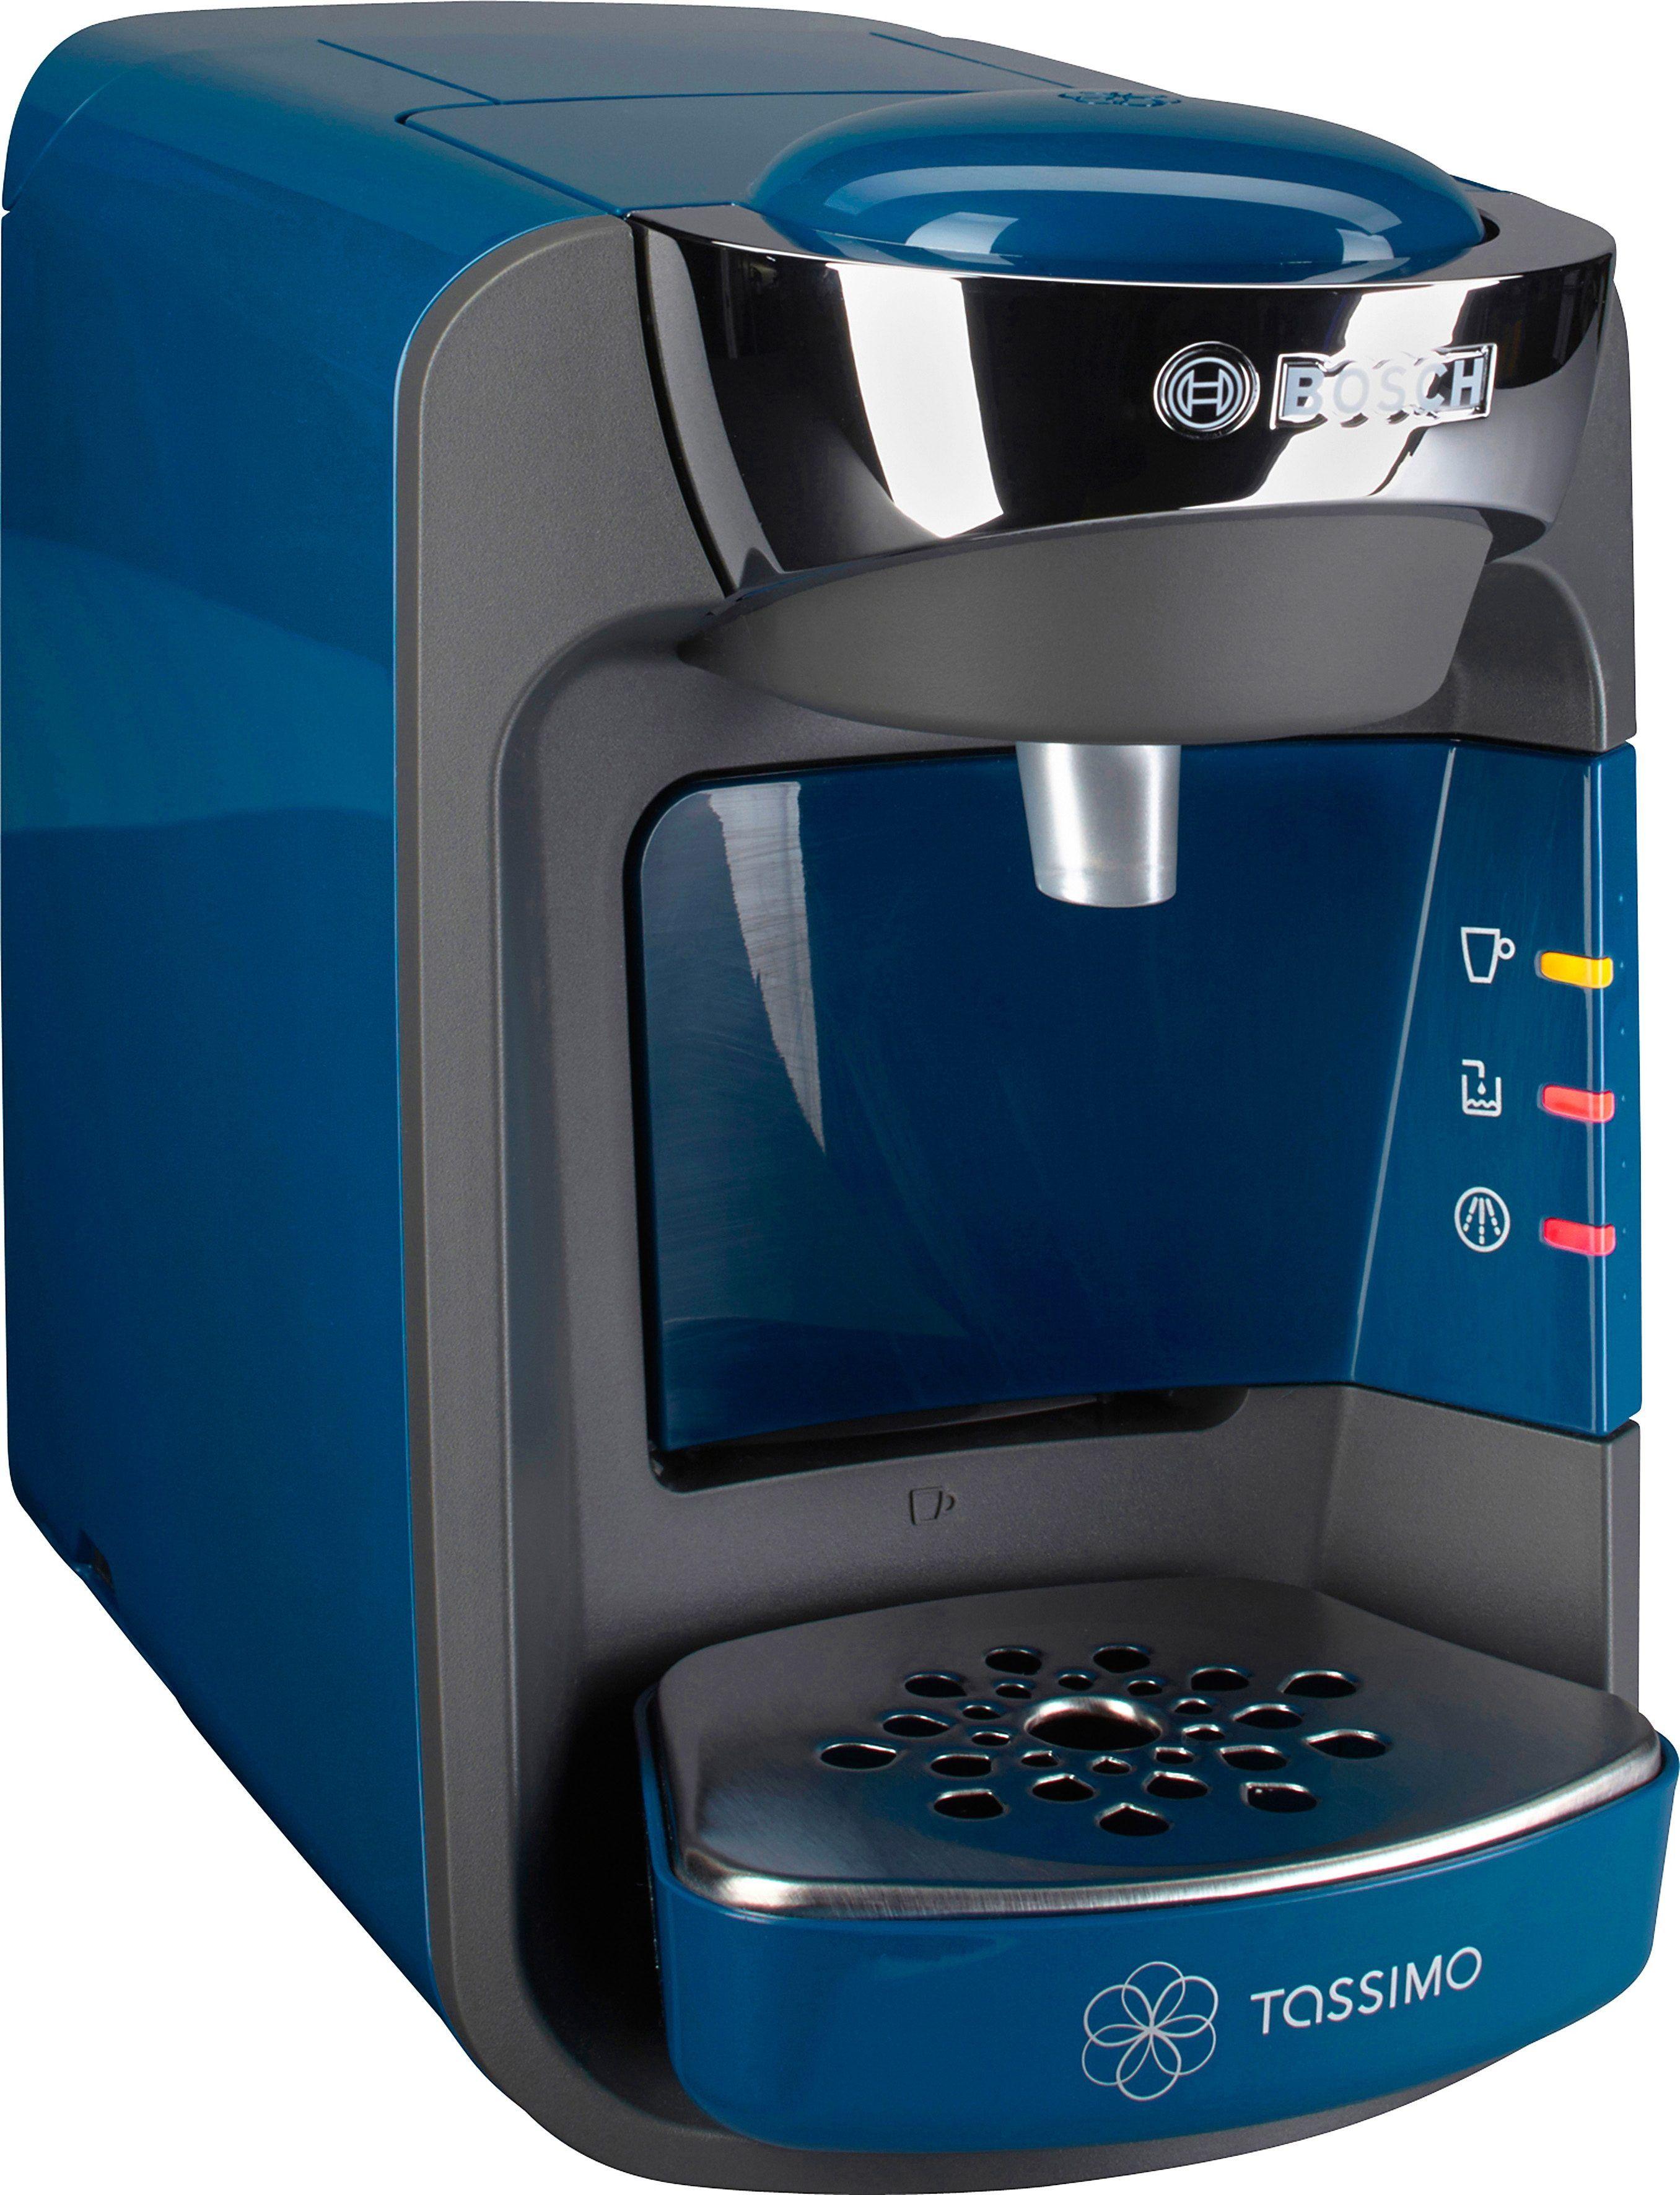 Bosch TASSIMO Multi Getränke Automat #Kaffee #Getränkeautomat ...